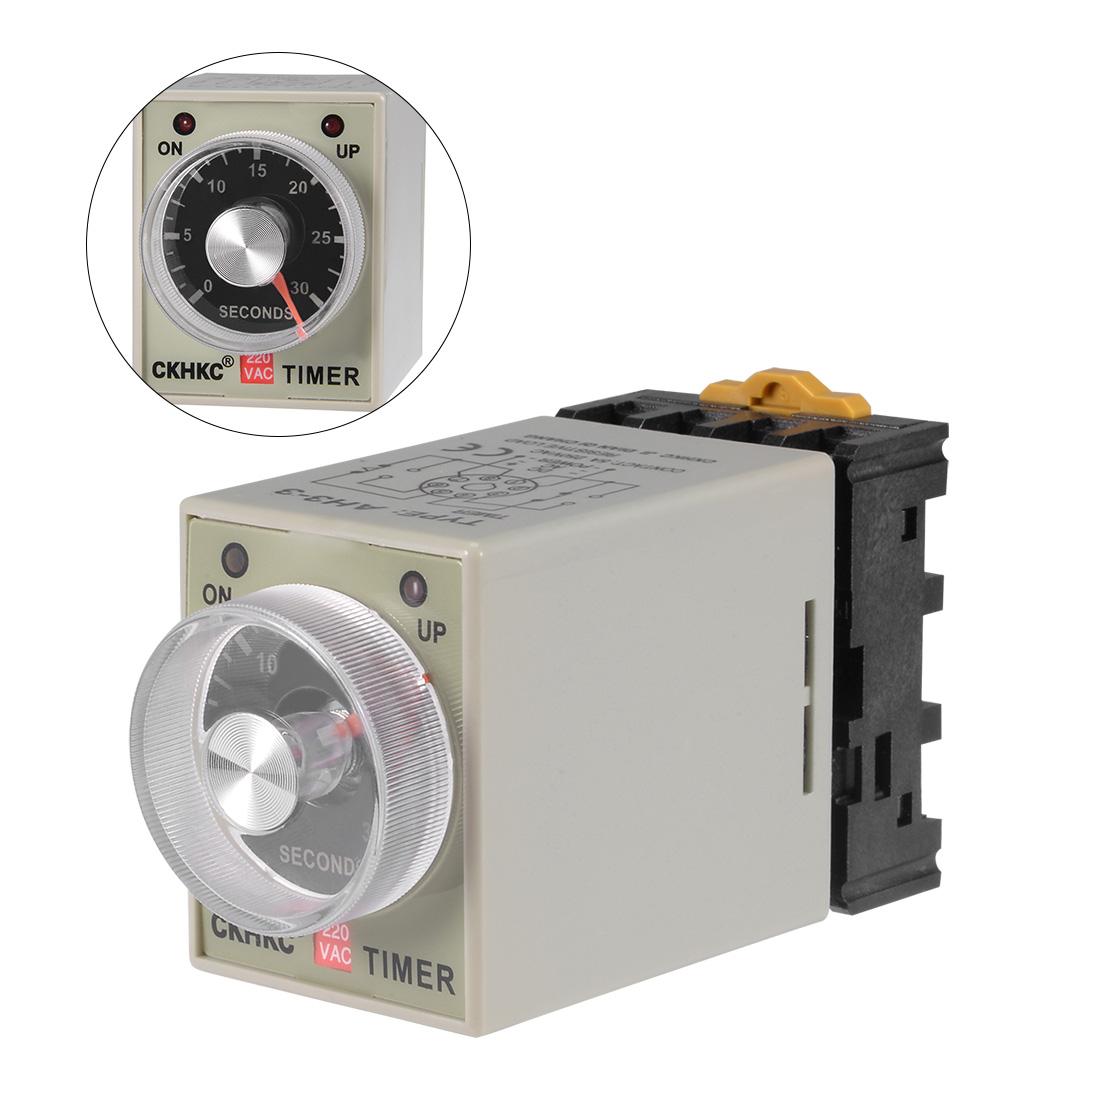 AC220V 30S 8 Terminals Range Adjustable Delay Timer Time Relay AH3-3 w base